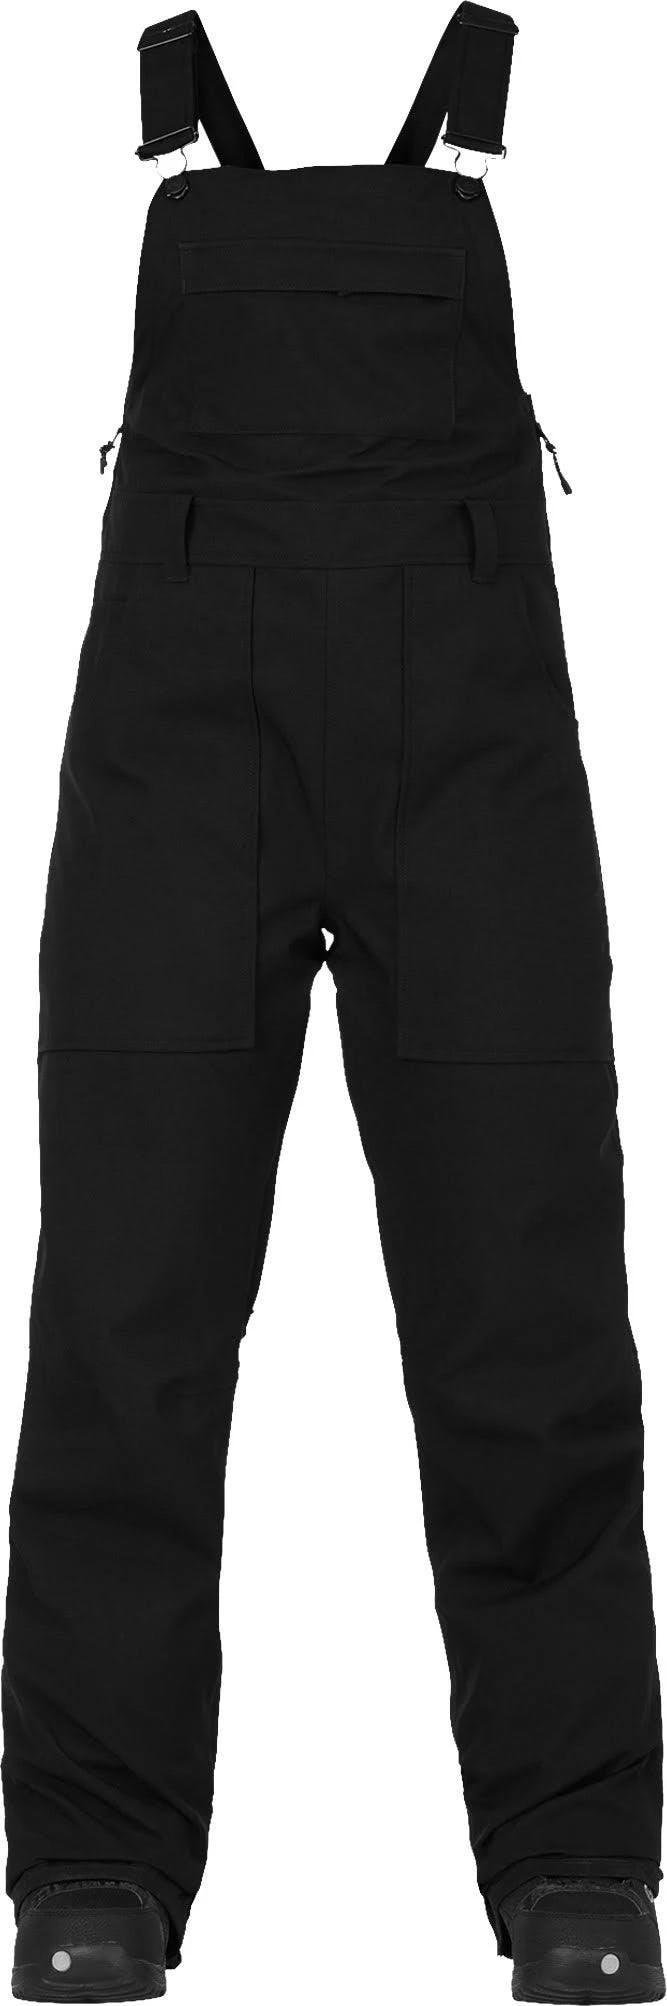 Burton Avalon Bib Pant Women's XS True Black